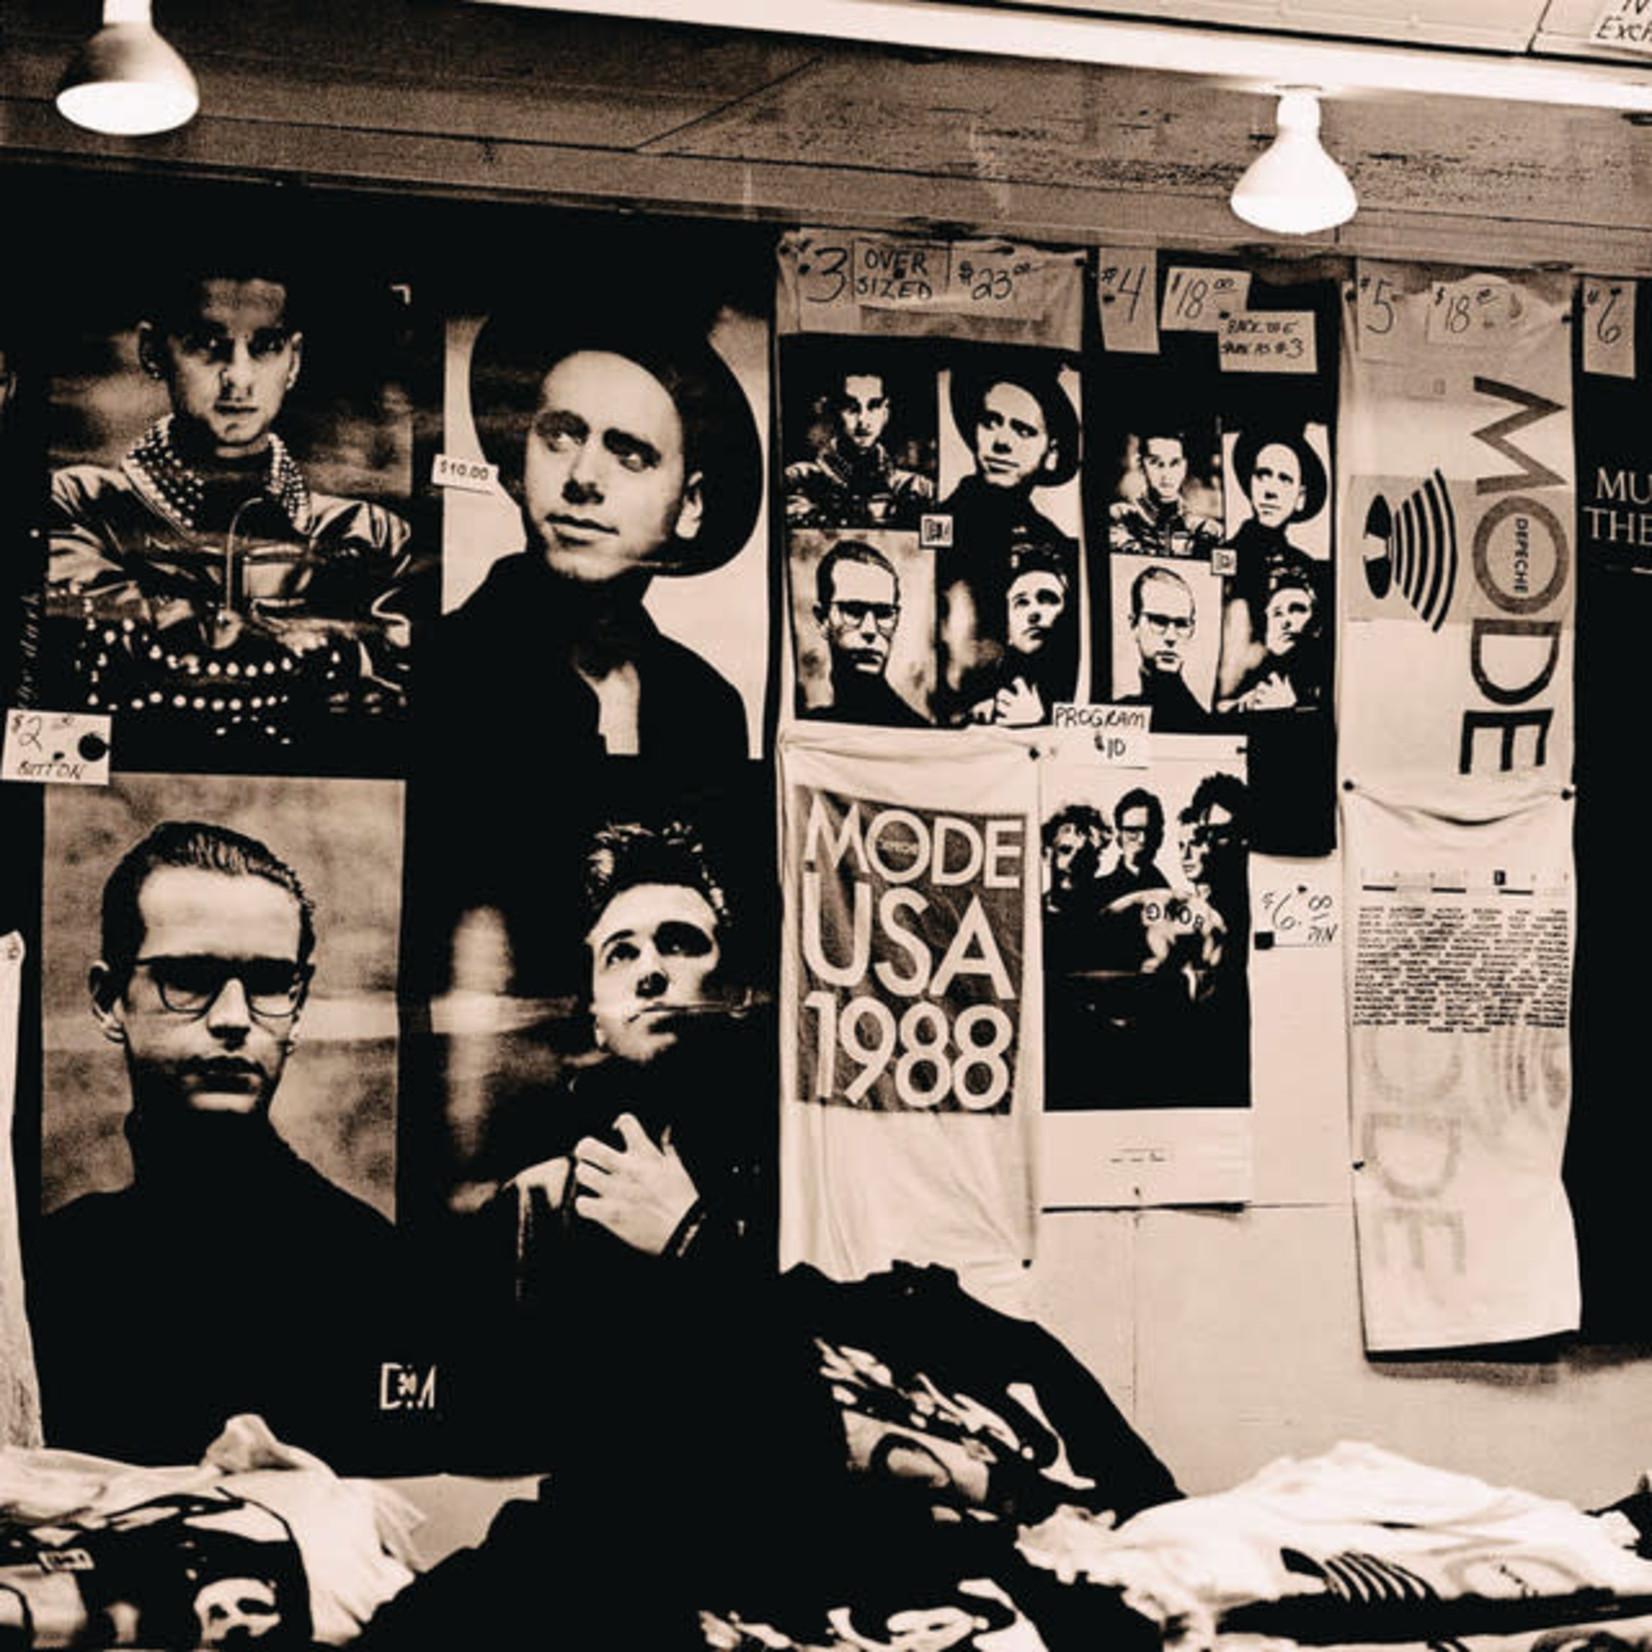 Vinyl Depeche Mode - 101 (Used)